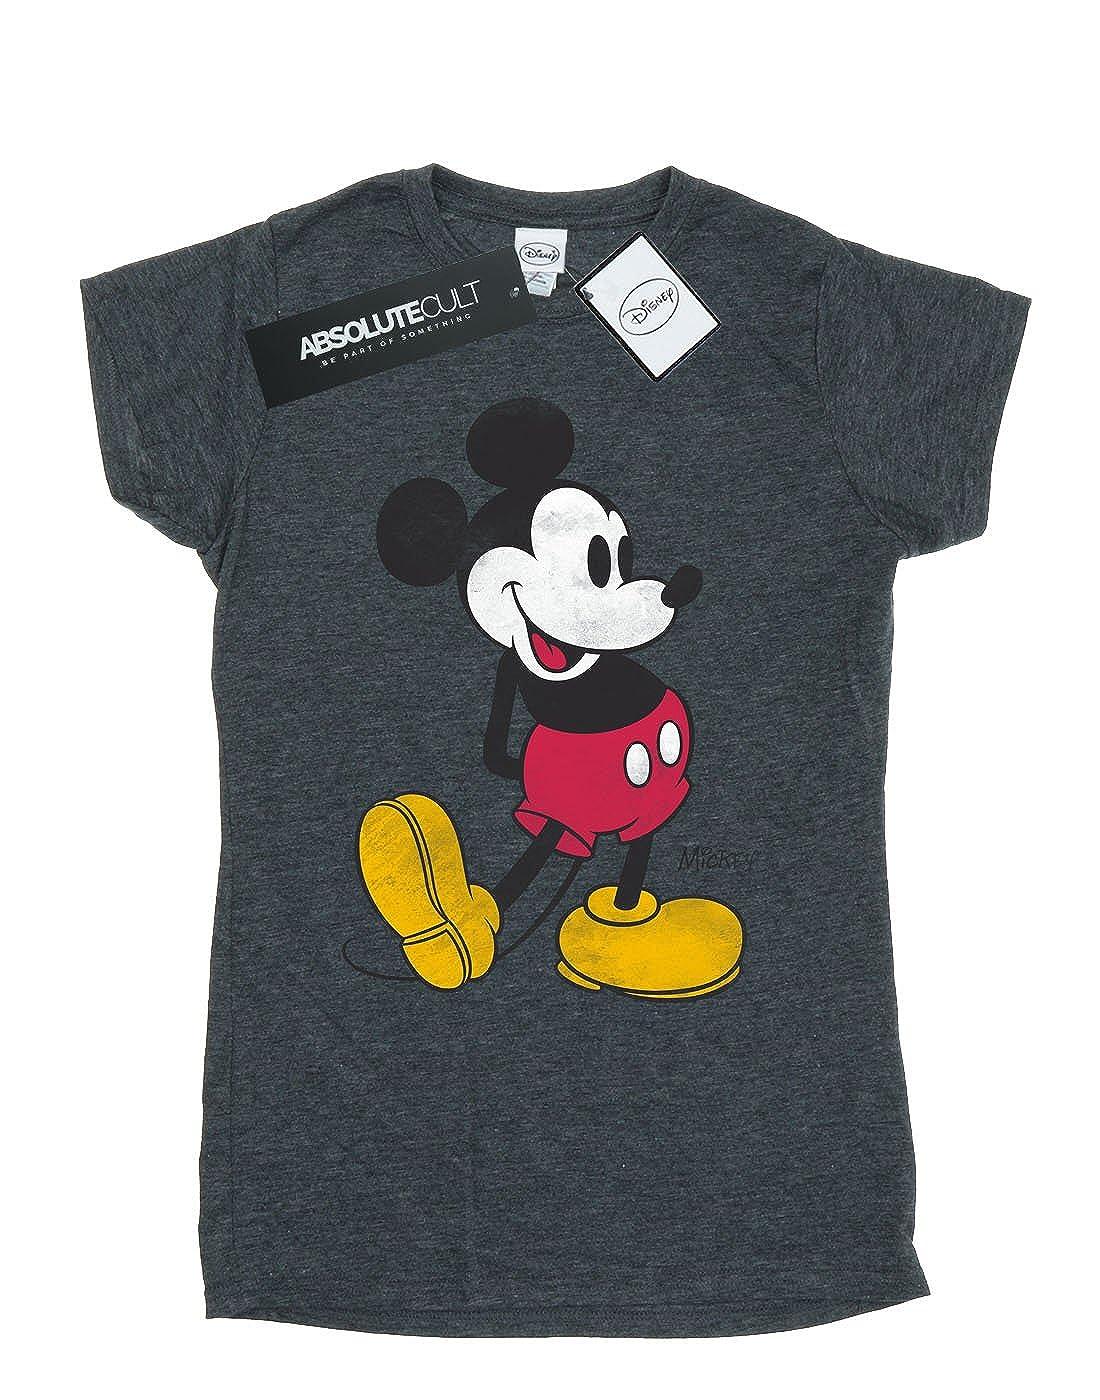 60476d8a Amazon.com: Disney Women's Mickey Mouse Classic Kick T-Shirt: Clothing